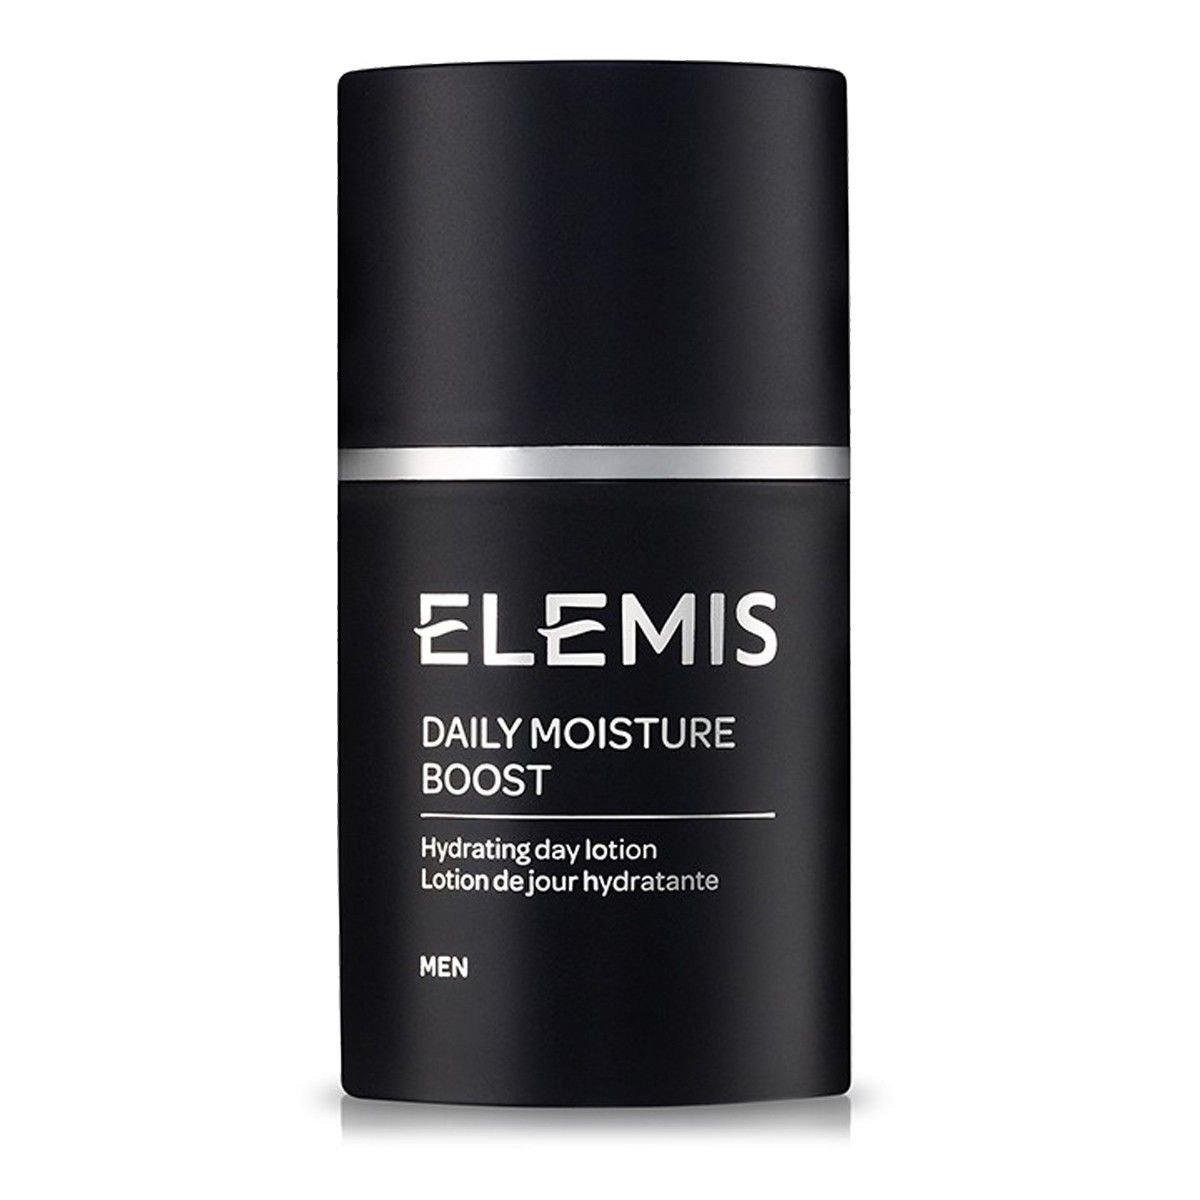 Afbeelding van Elemis Daily Moisture Boost Men Skincare Beauty